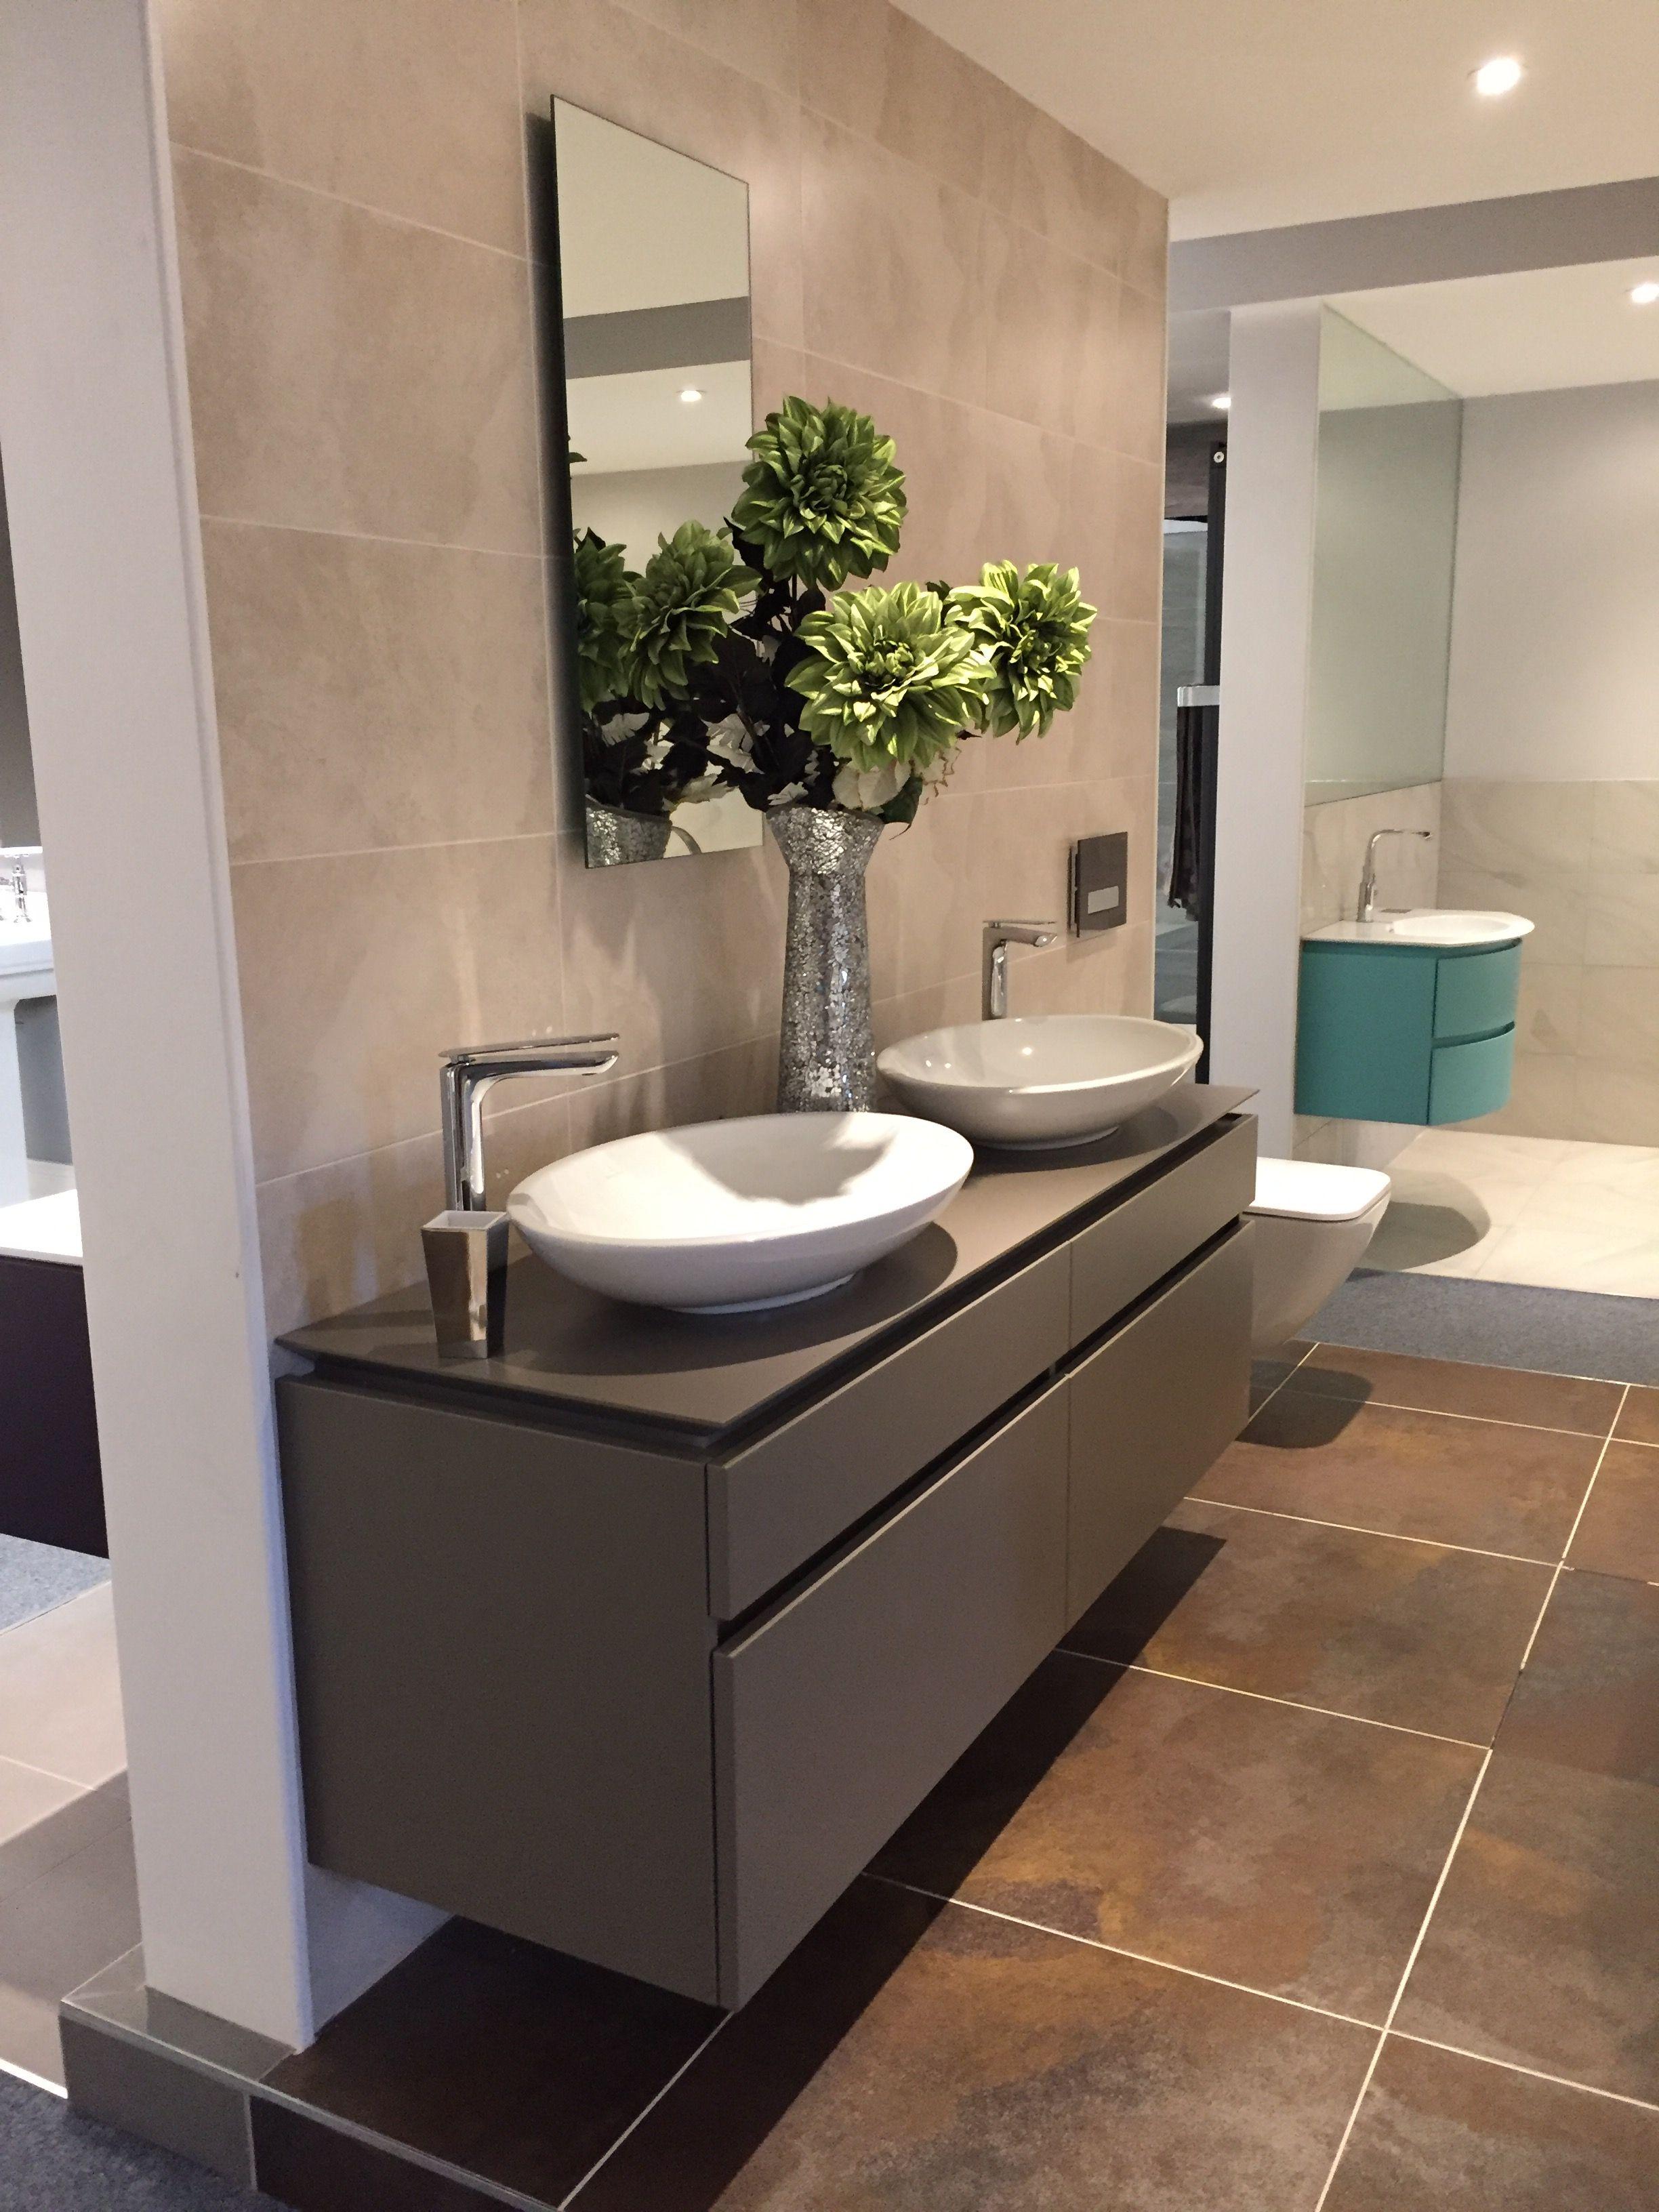 Mayflower Bathrooms Wellington. Villeroy and Boch sinks.  Ideal